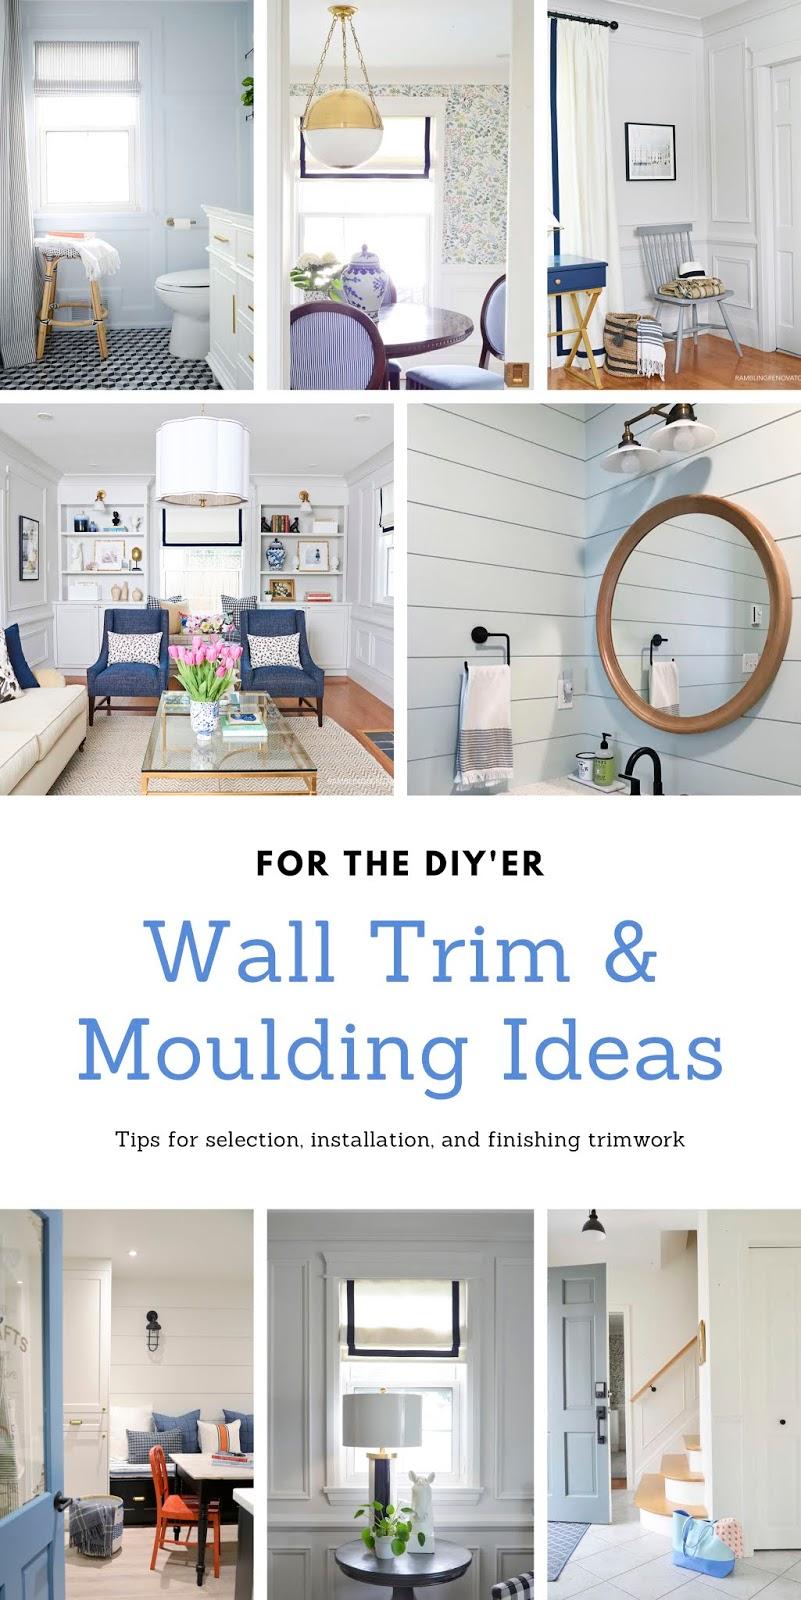 wall trim ideas, wall moulding, wall molding, shiplap alternatives, board and batten, wainscotting